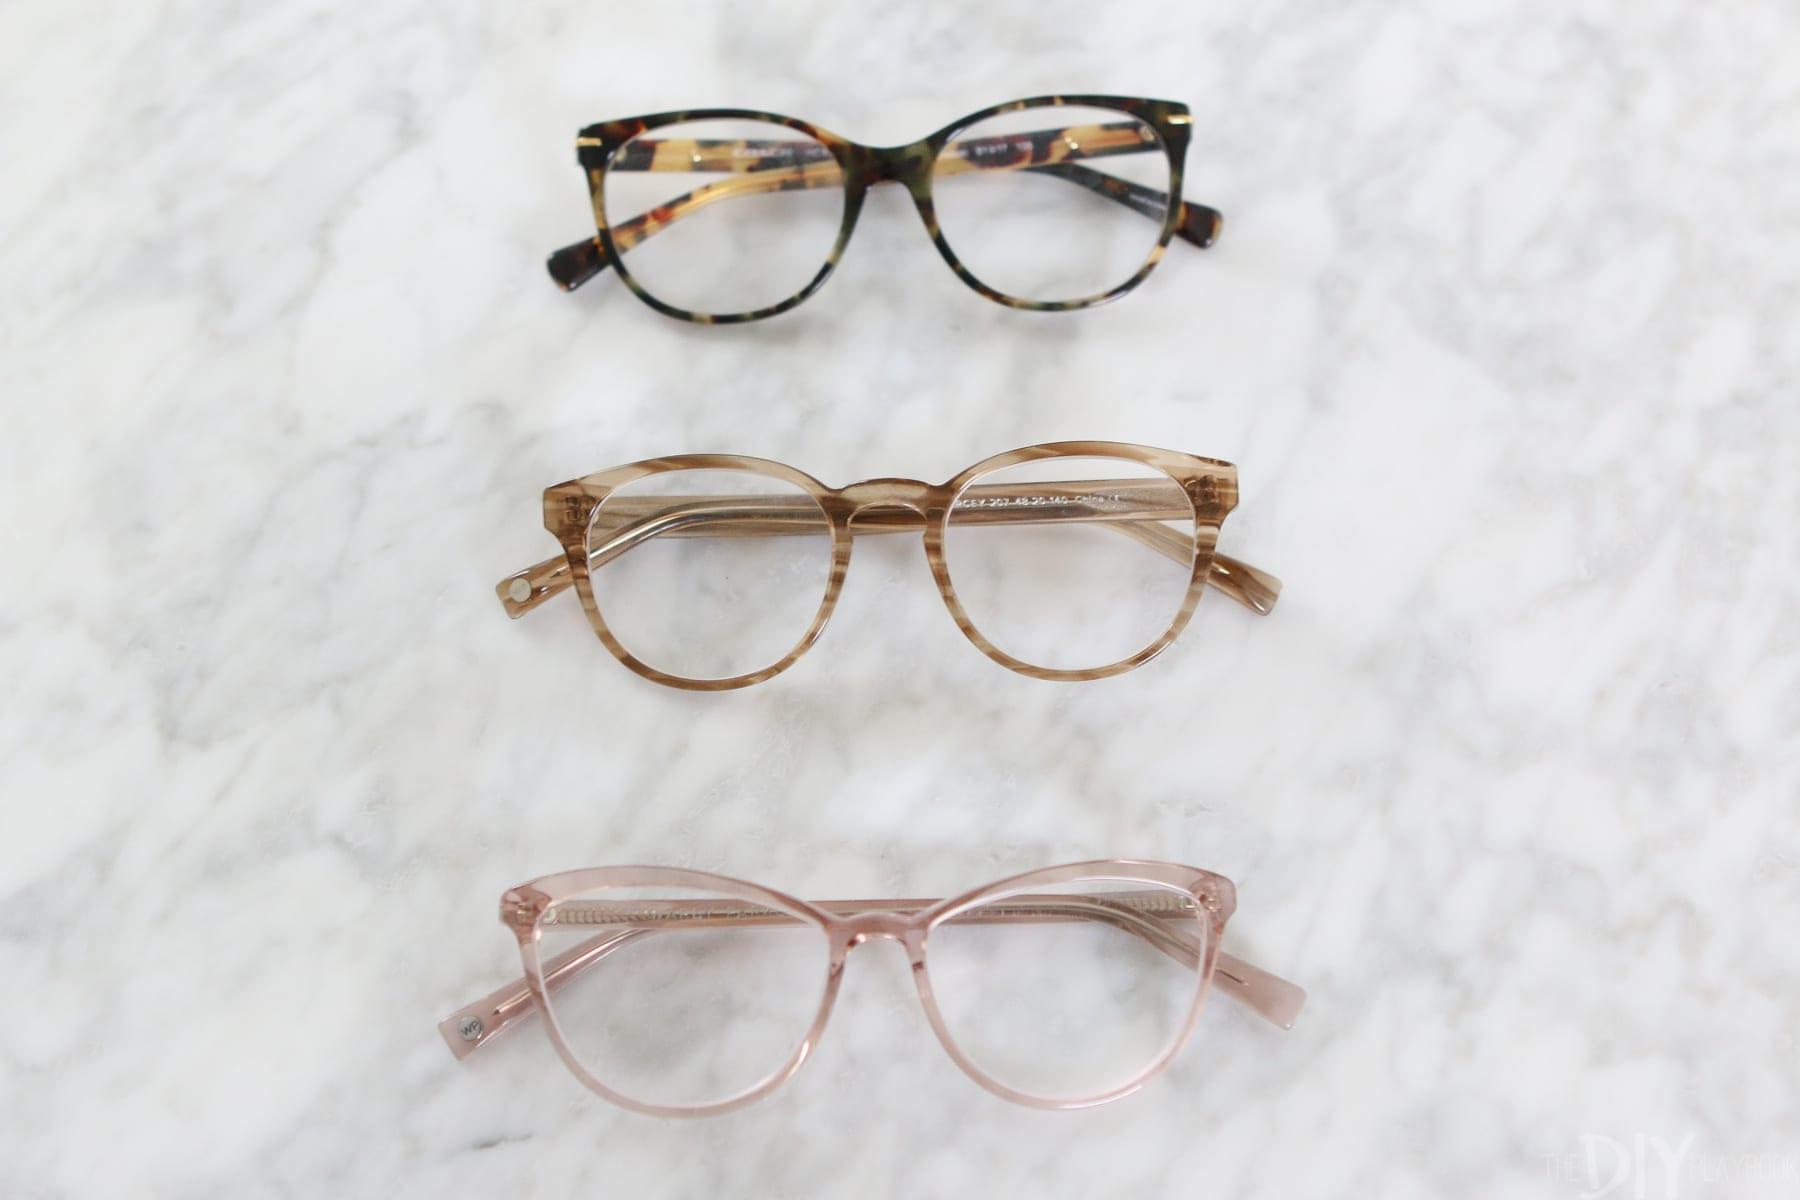 40ed24dedb Shopping for Glasses Online  Warby Parker